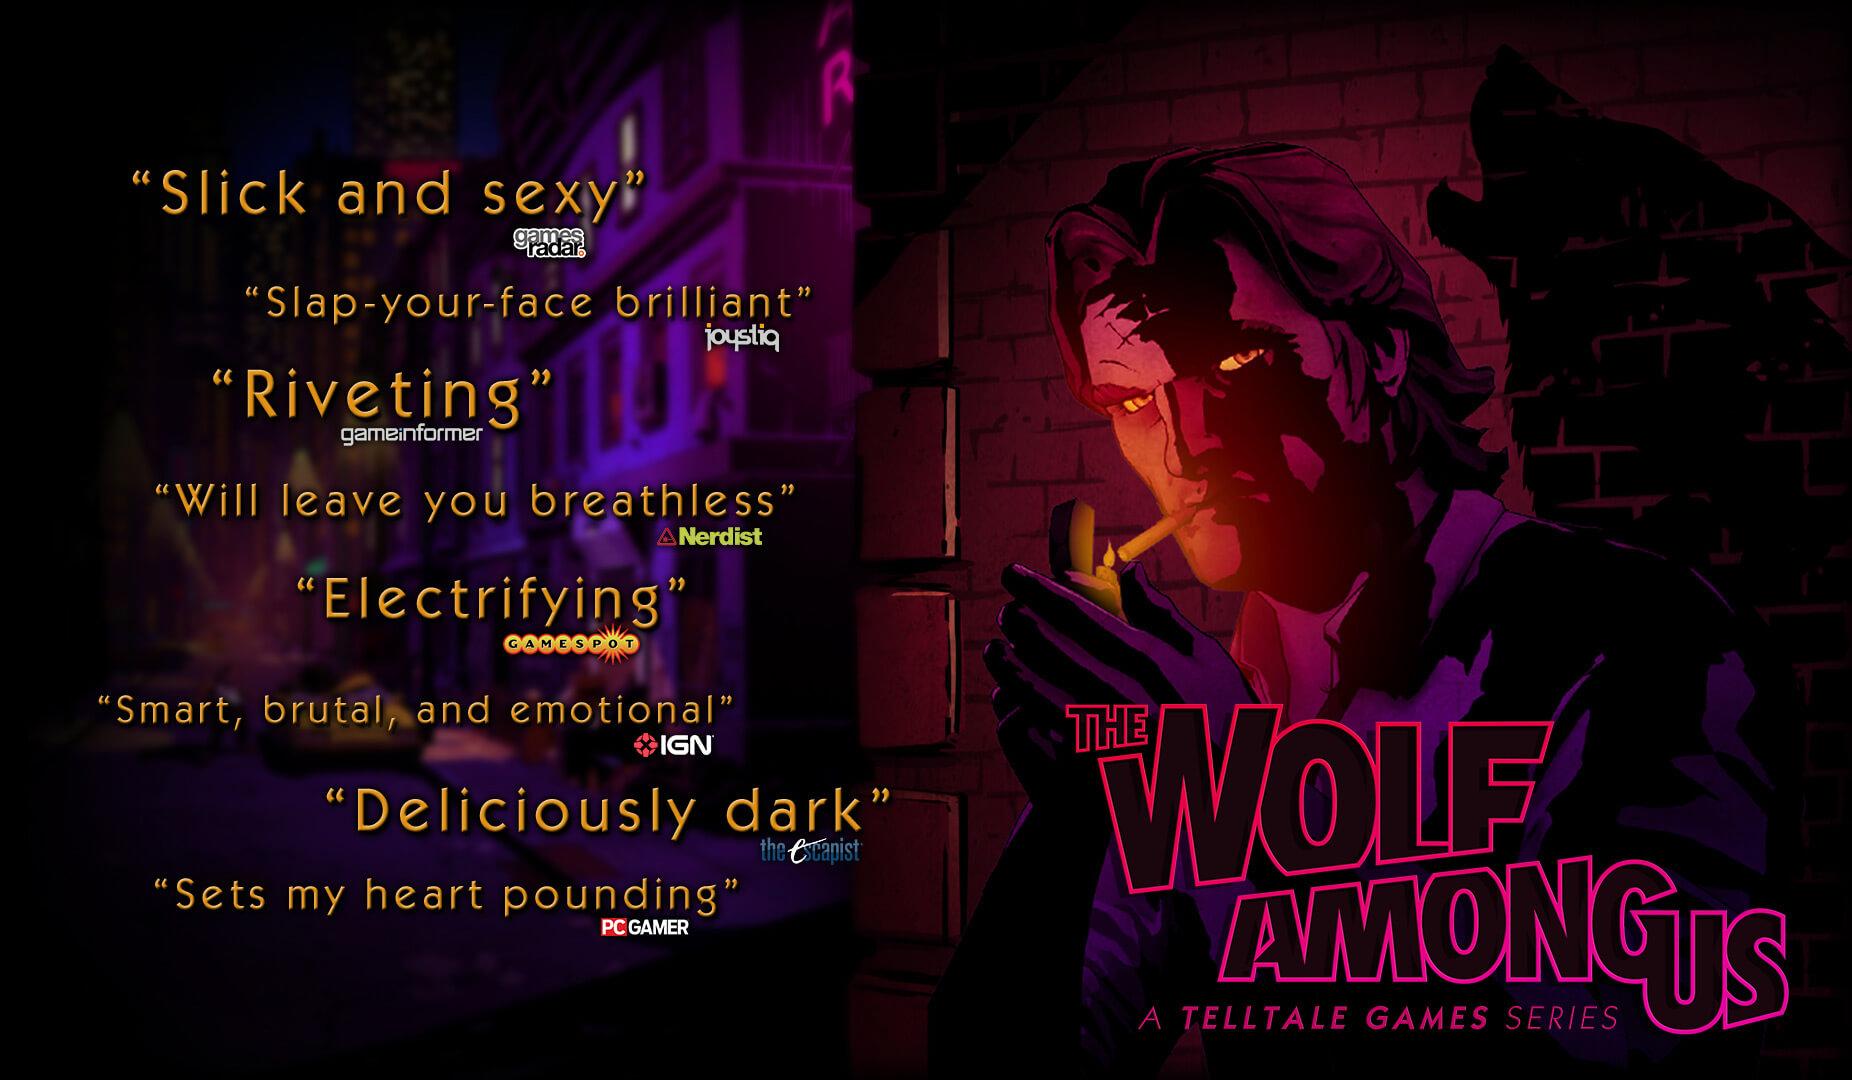 The Wolf Among Us Image